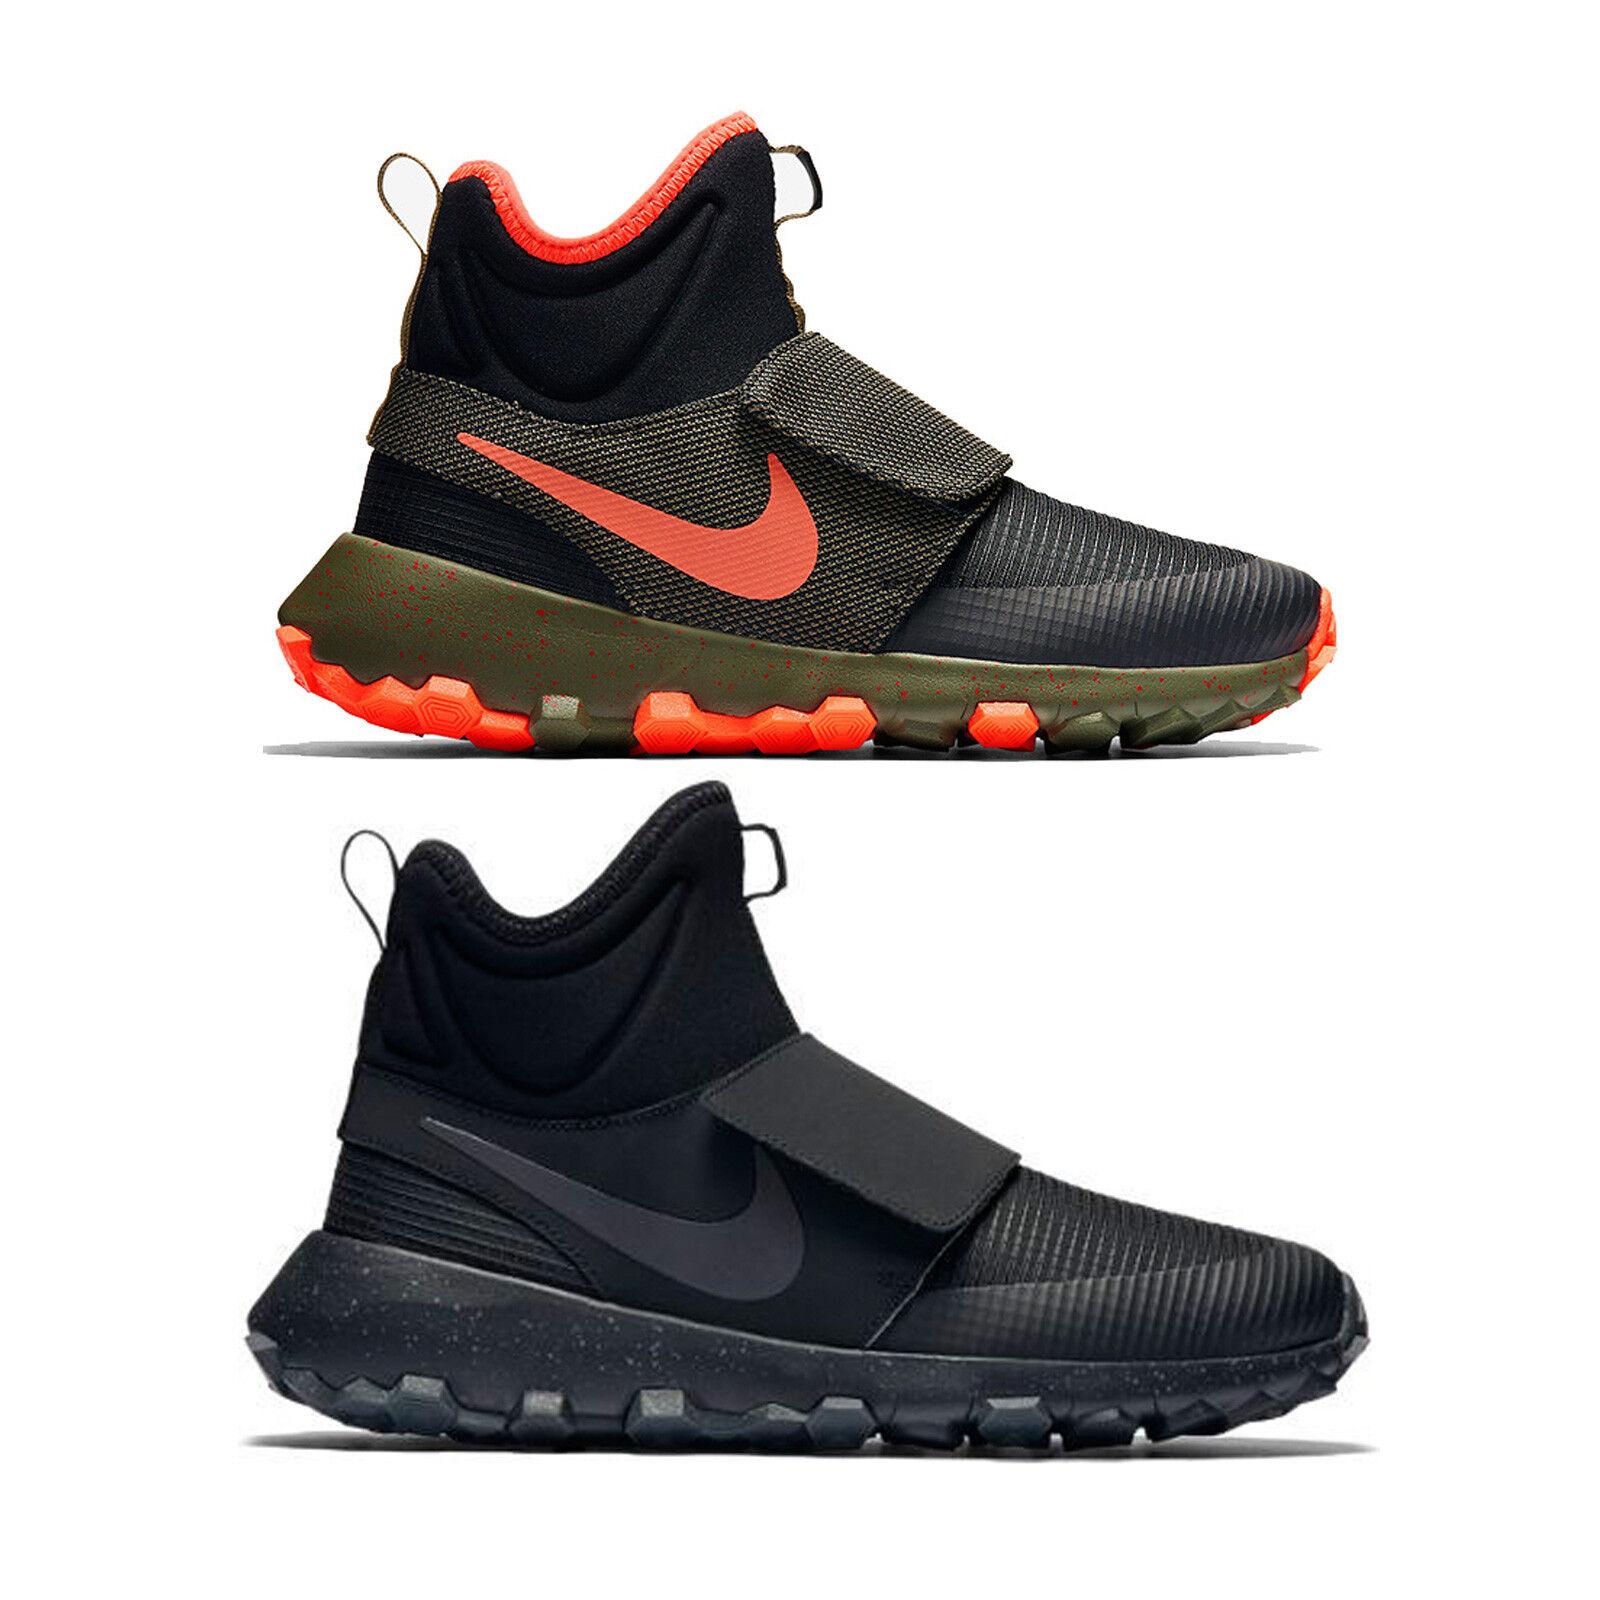 Nike Roshe Mid Winter Stamina GS Sneakerboot Schuhe schwarz oliv oliv schwarz 859621 001 003 1b54c3